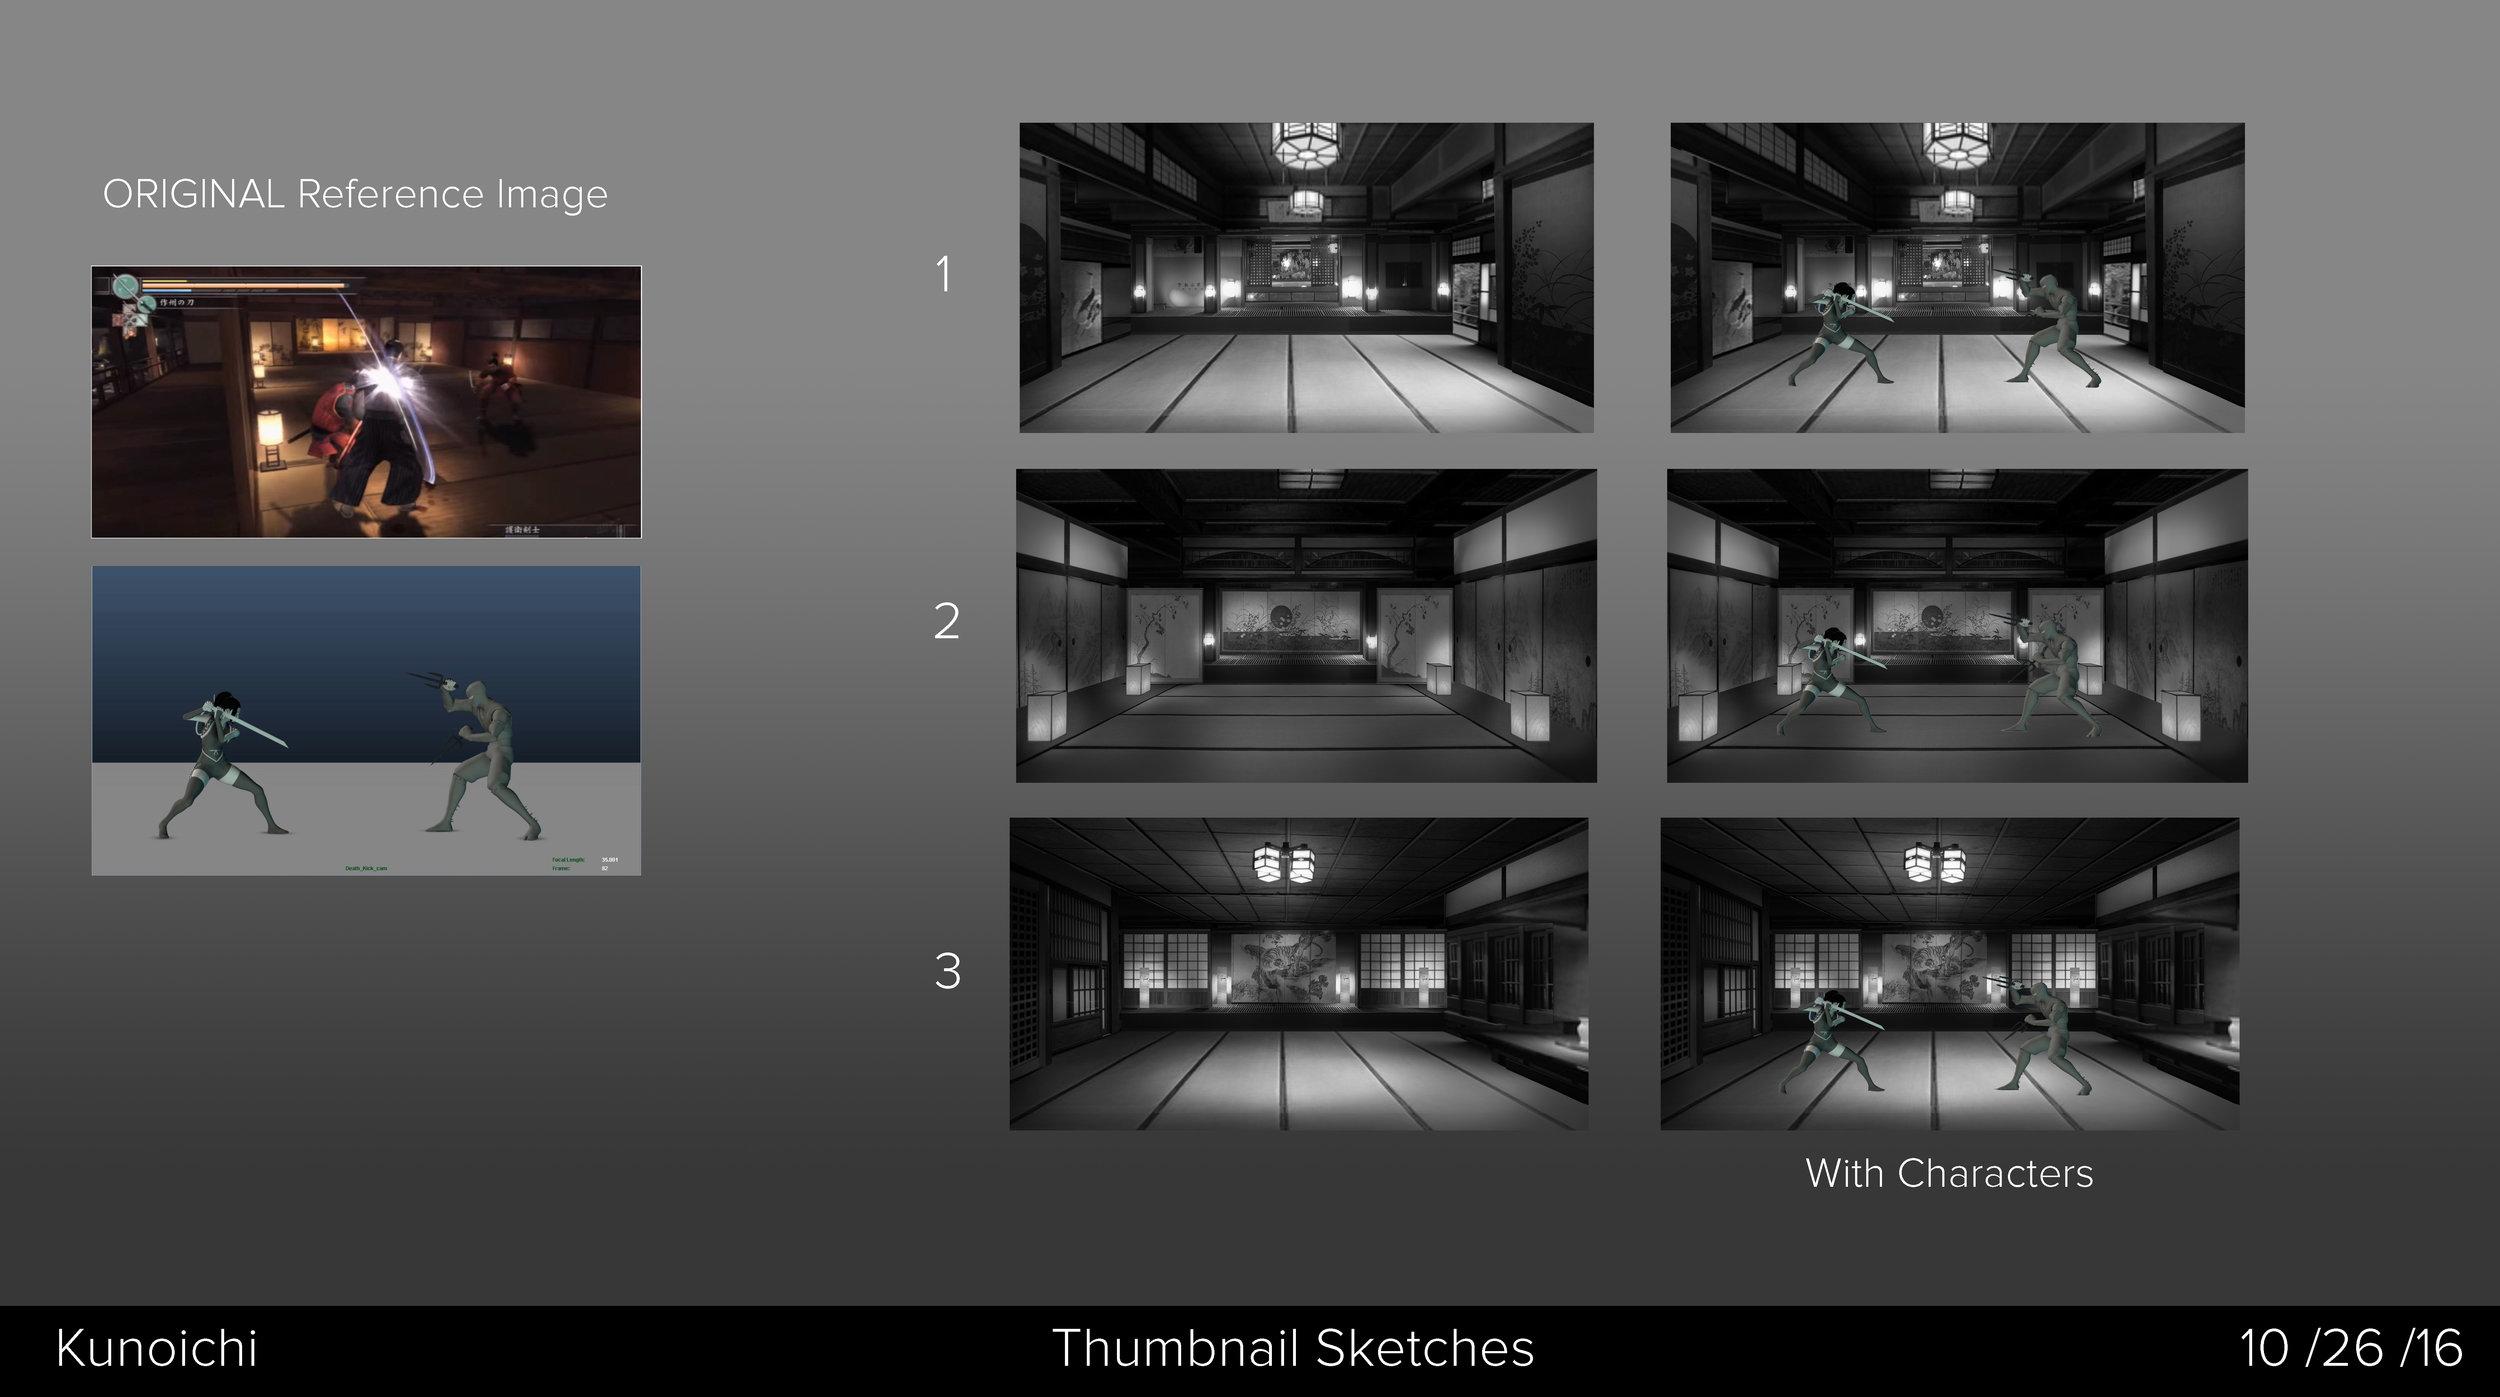 KUNOICHI_InnRoom_thumbnails_10_26.jpg